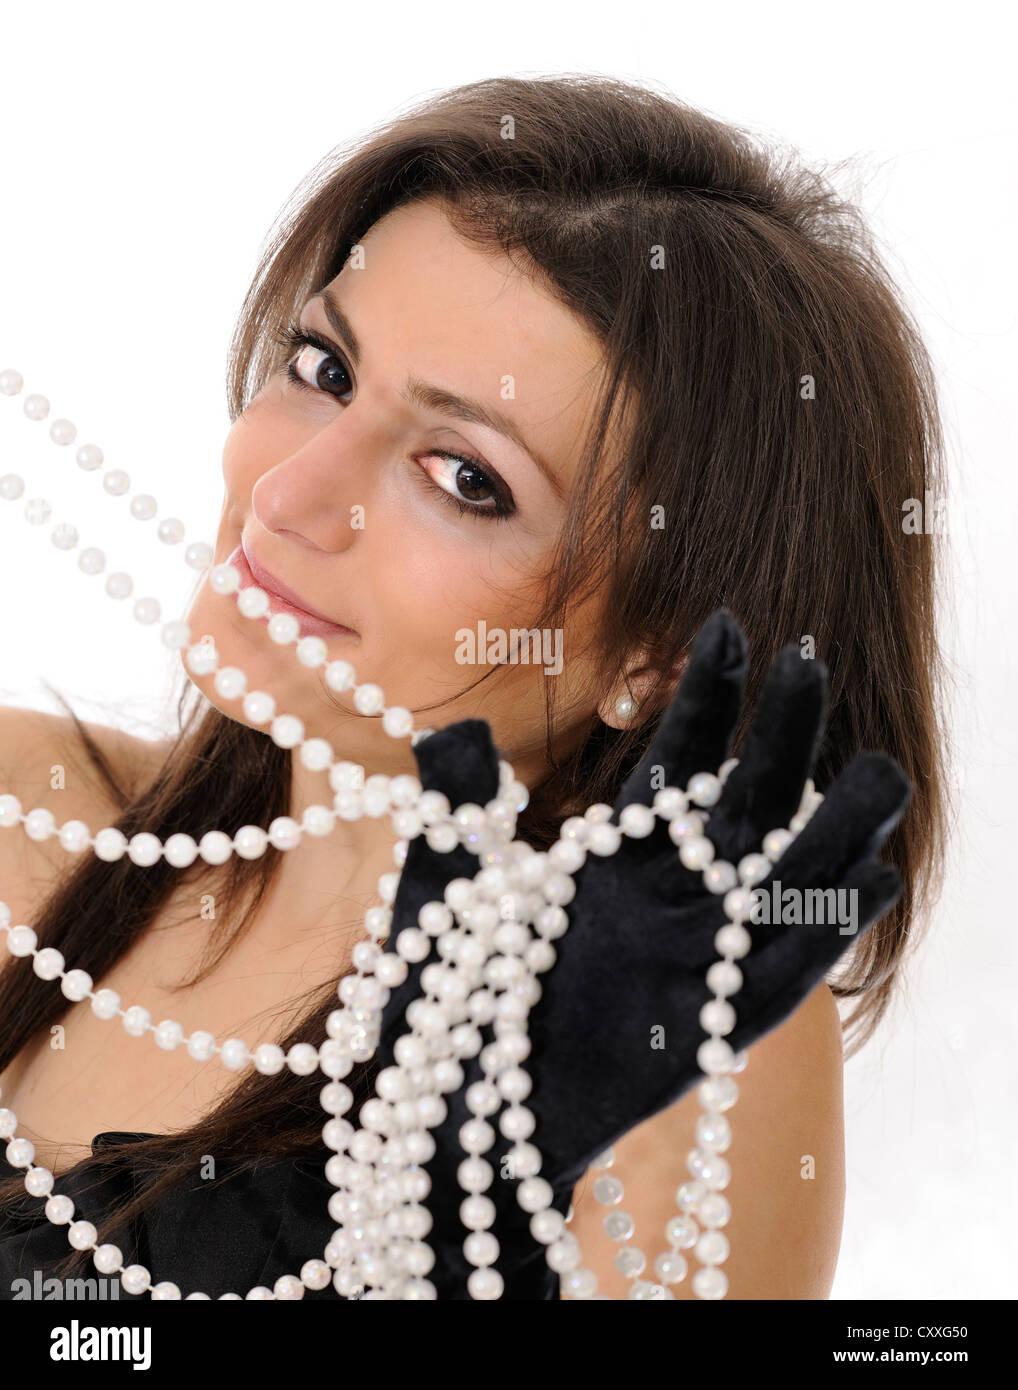 327ac8e82ba Young woman in a black dress